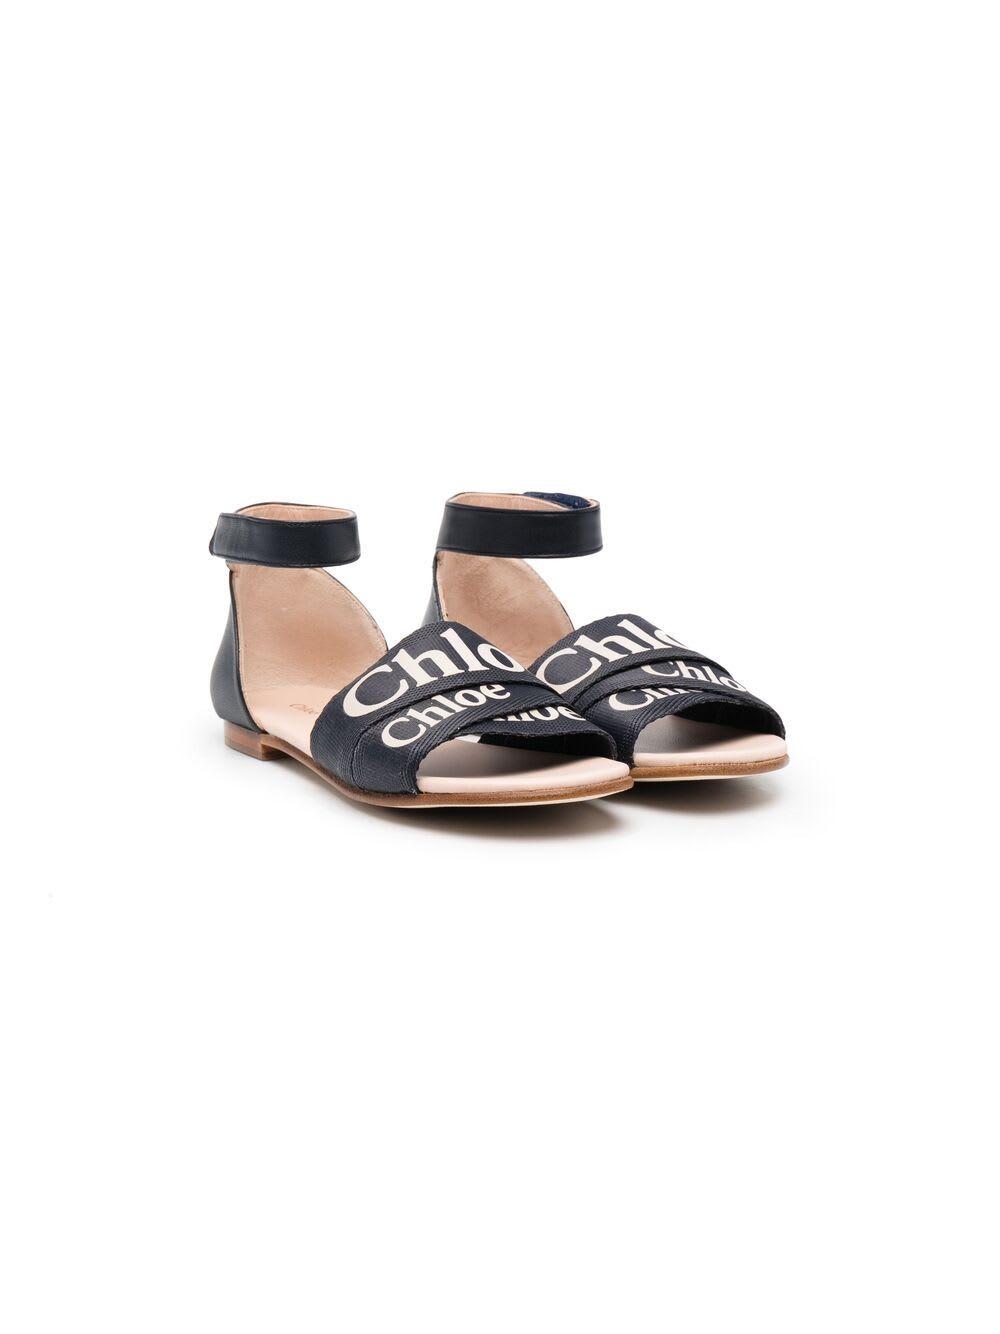 Chloé Open Toe Sandal